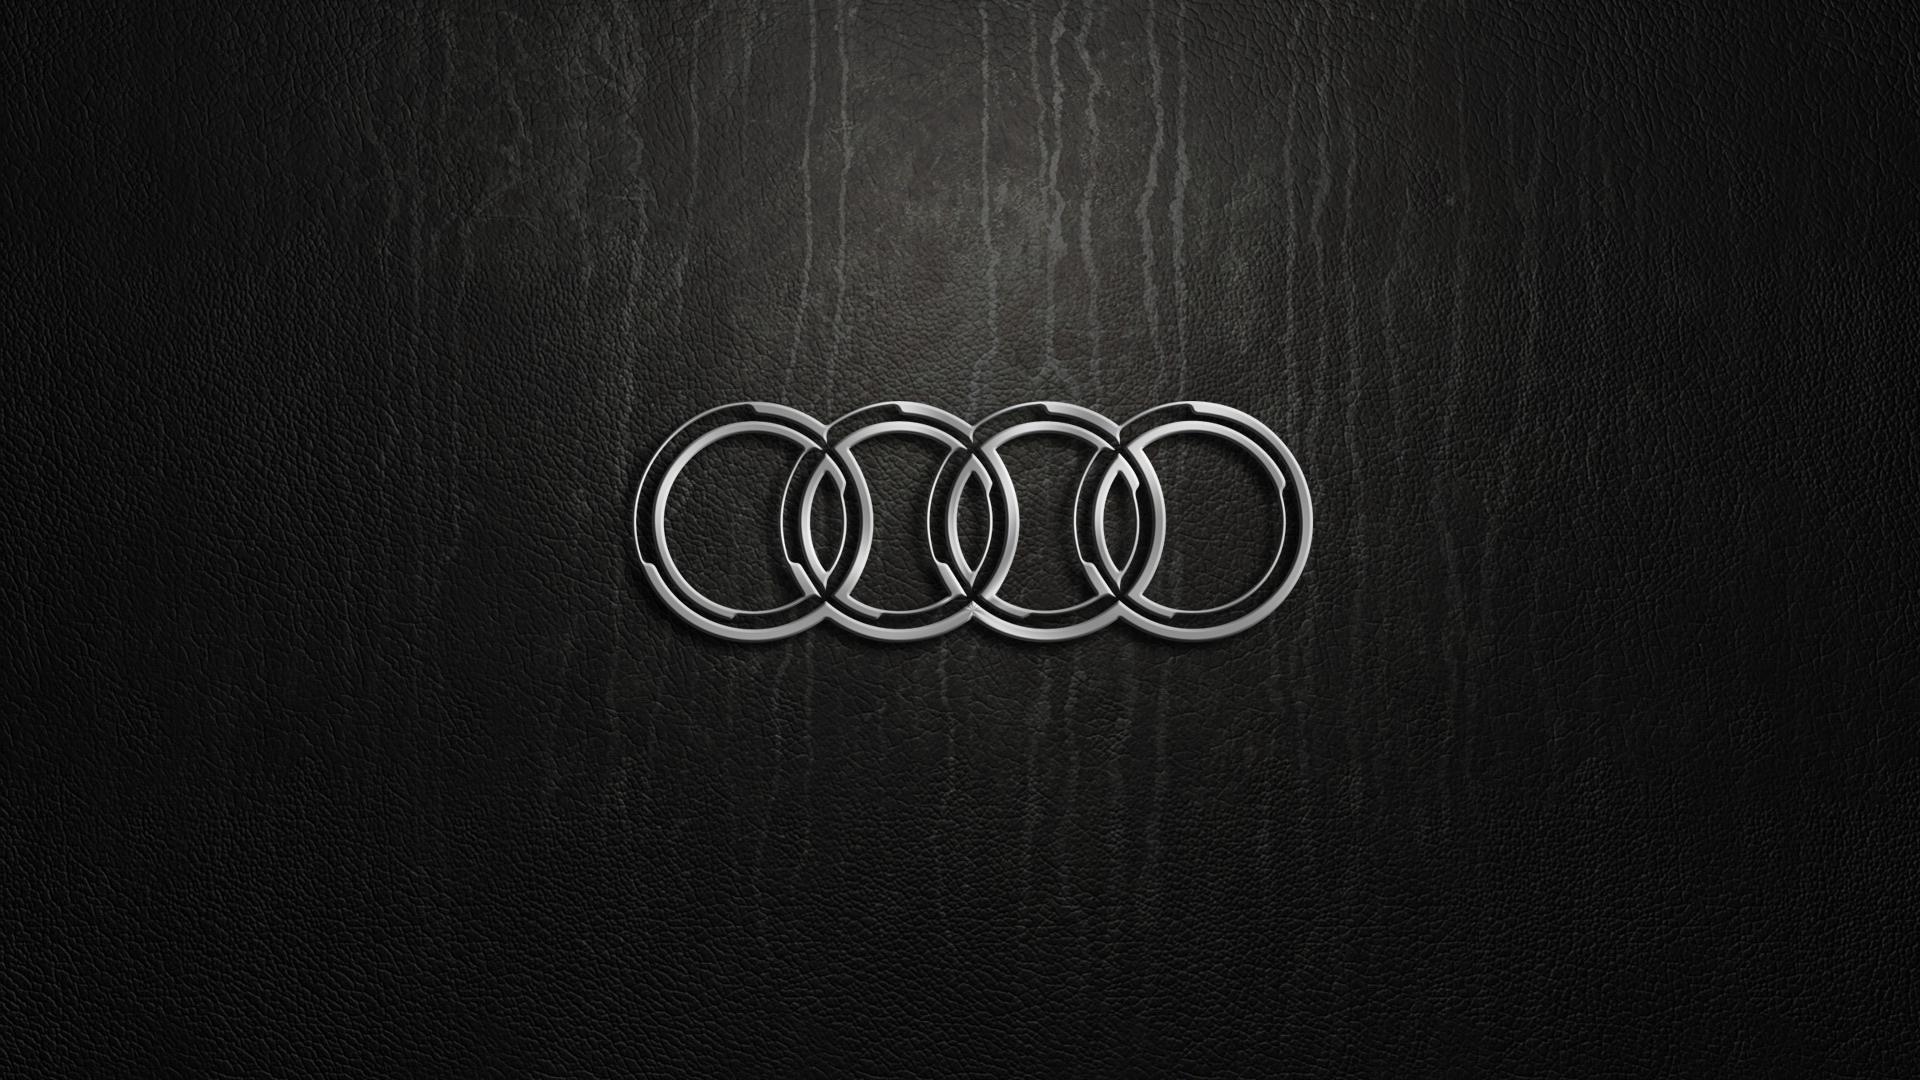 Audi Logo Computer Wallpaper 58774 1920x1080 Px